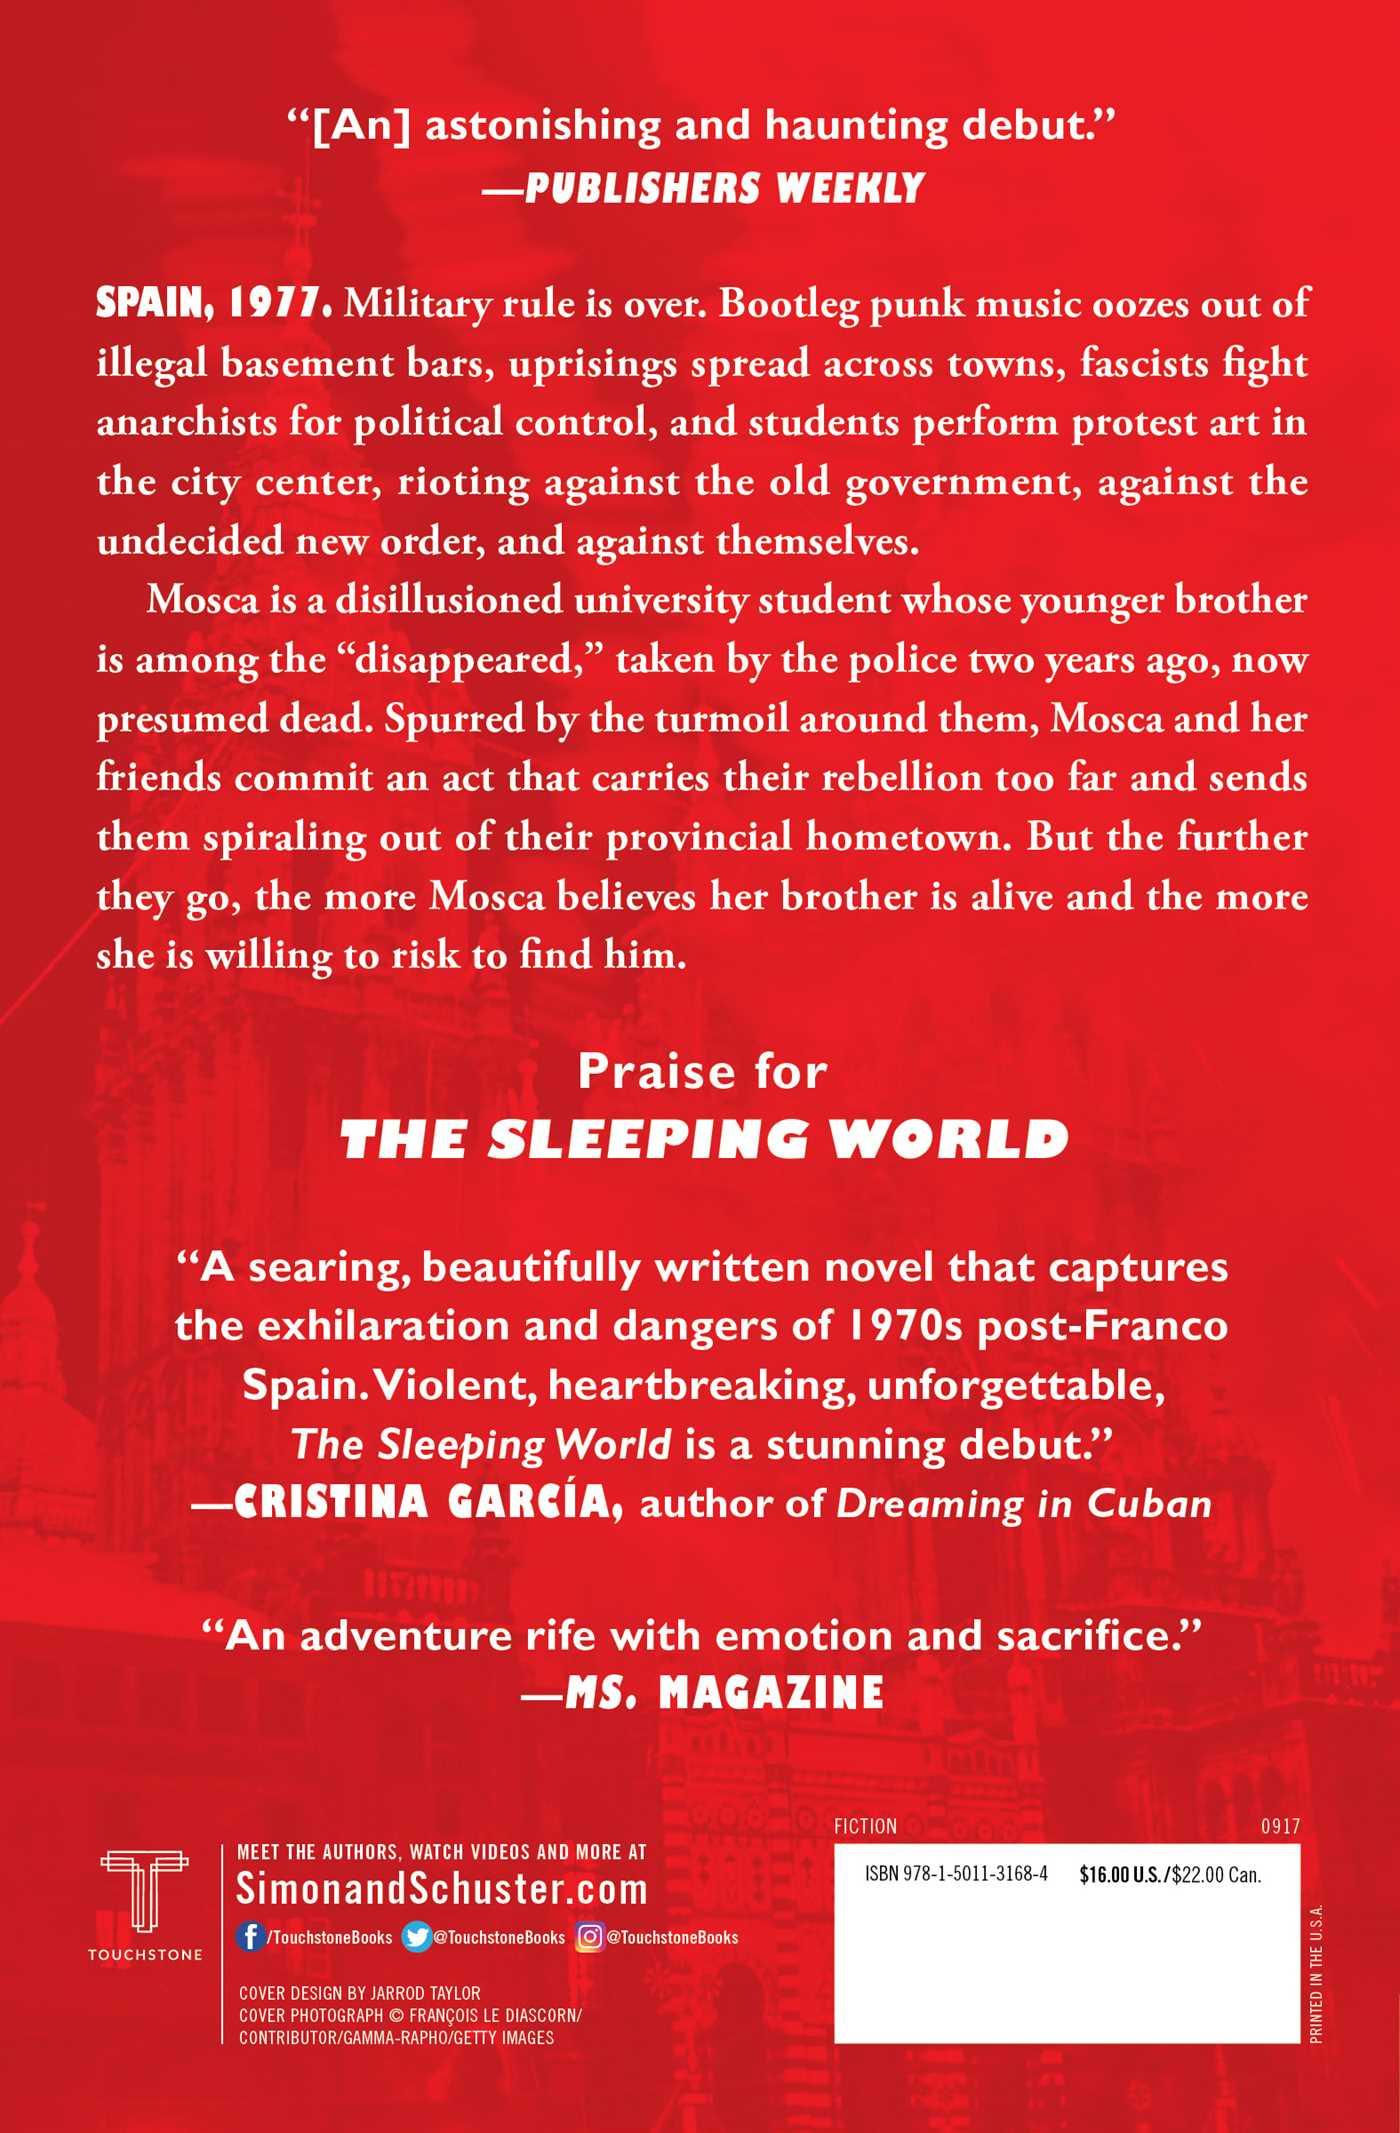 The sleeping world 9781501131684 hr back